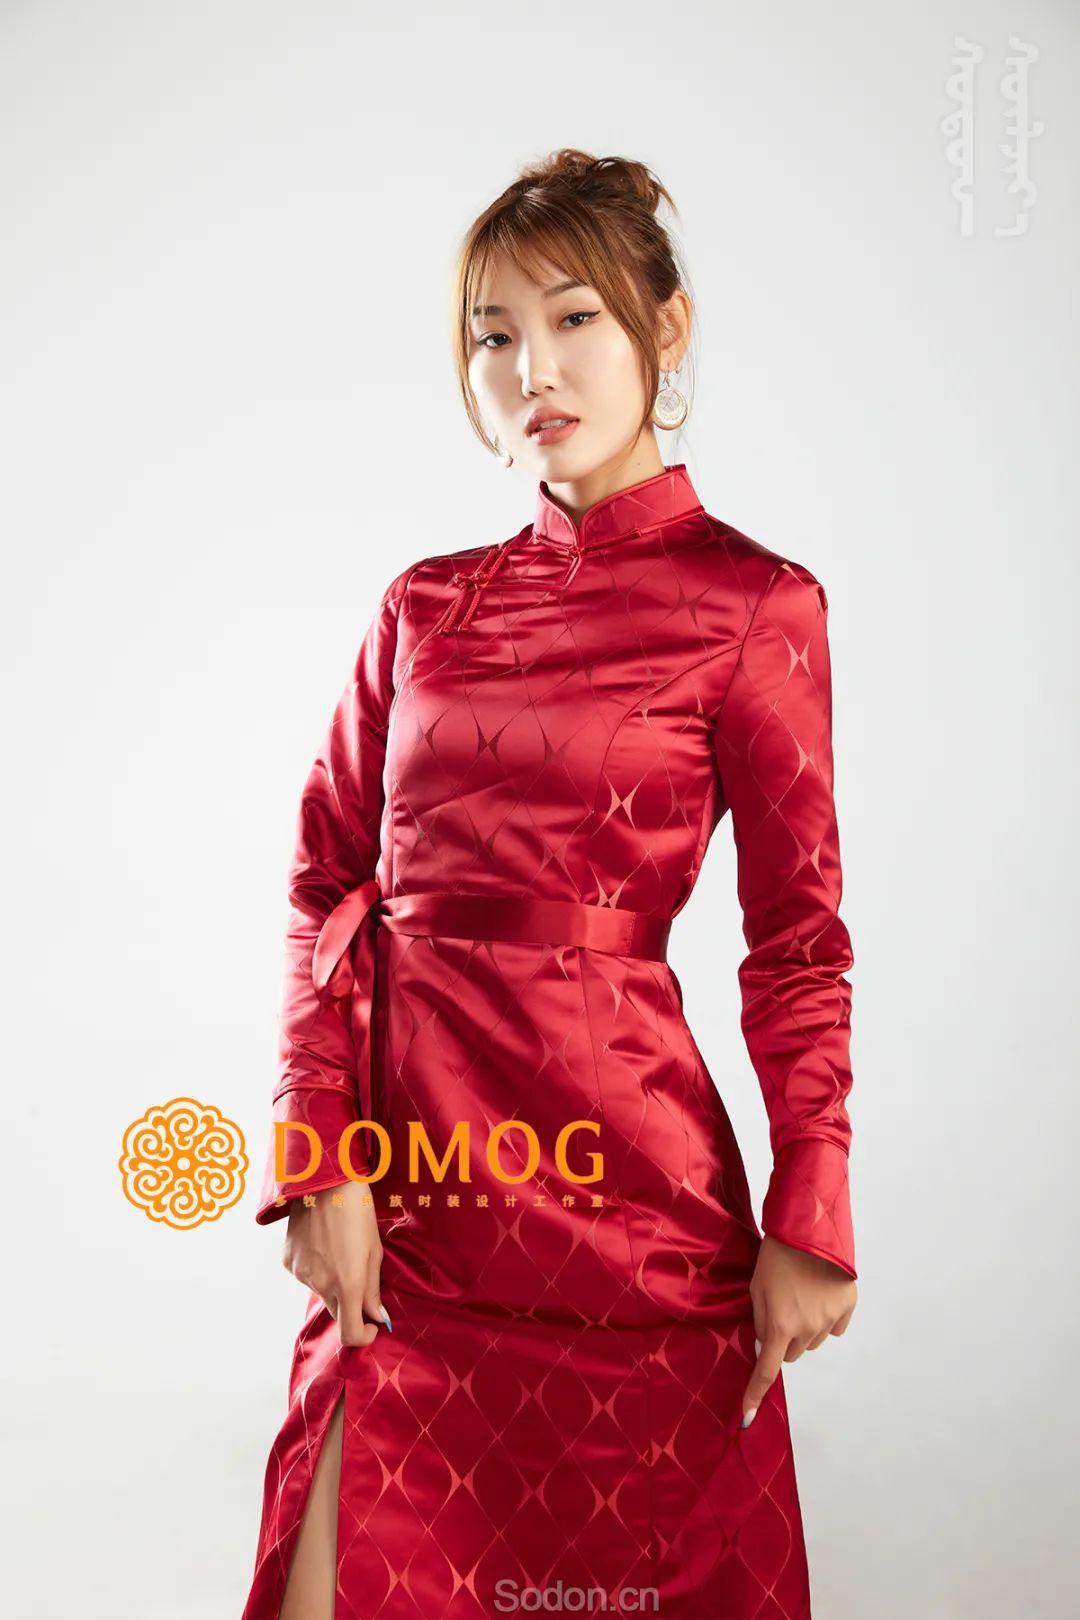 DOMOG 蒙古时装2020新款,民族与时尚的融合 第14张 DOMOG 蒙古时装2020新款,民族与时尚的融合 蒙古服饰